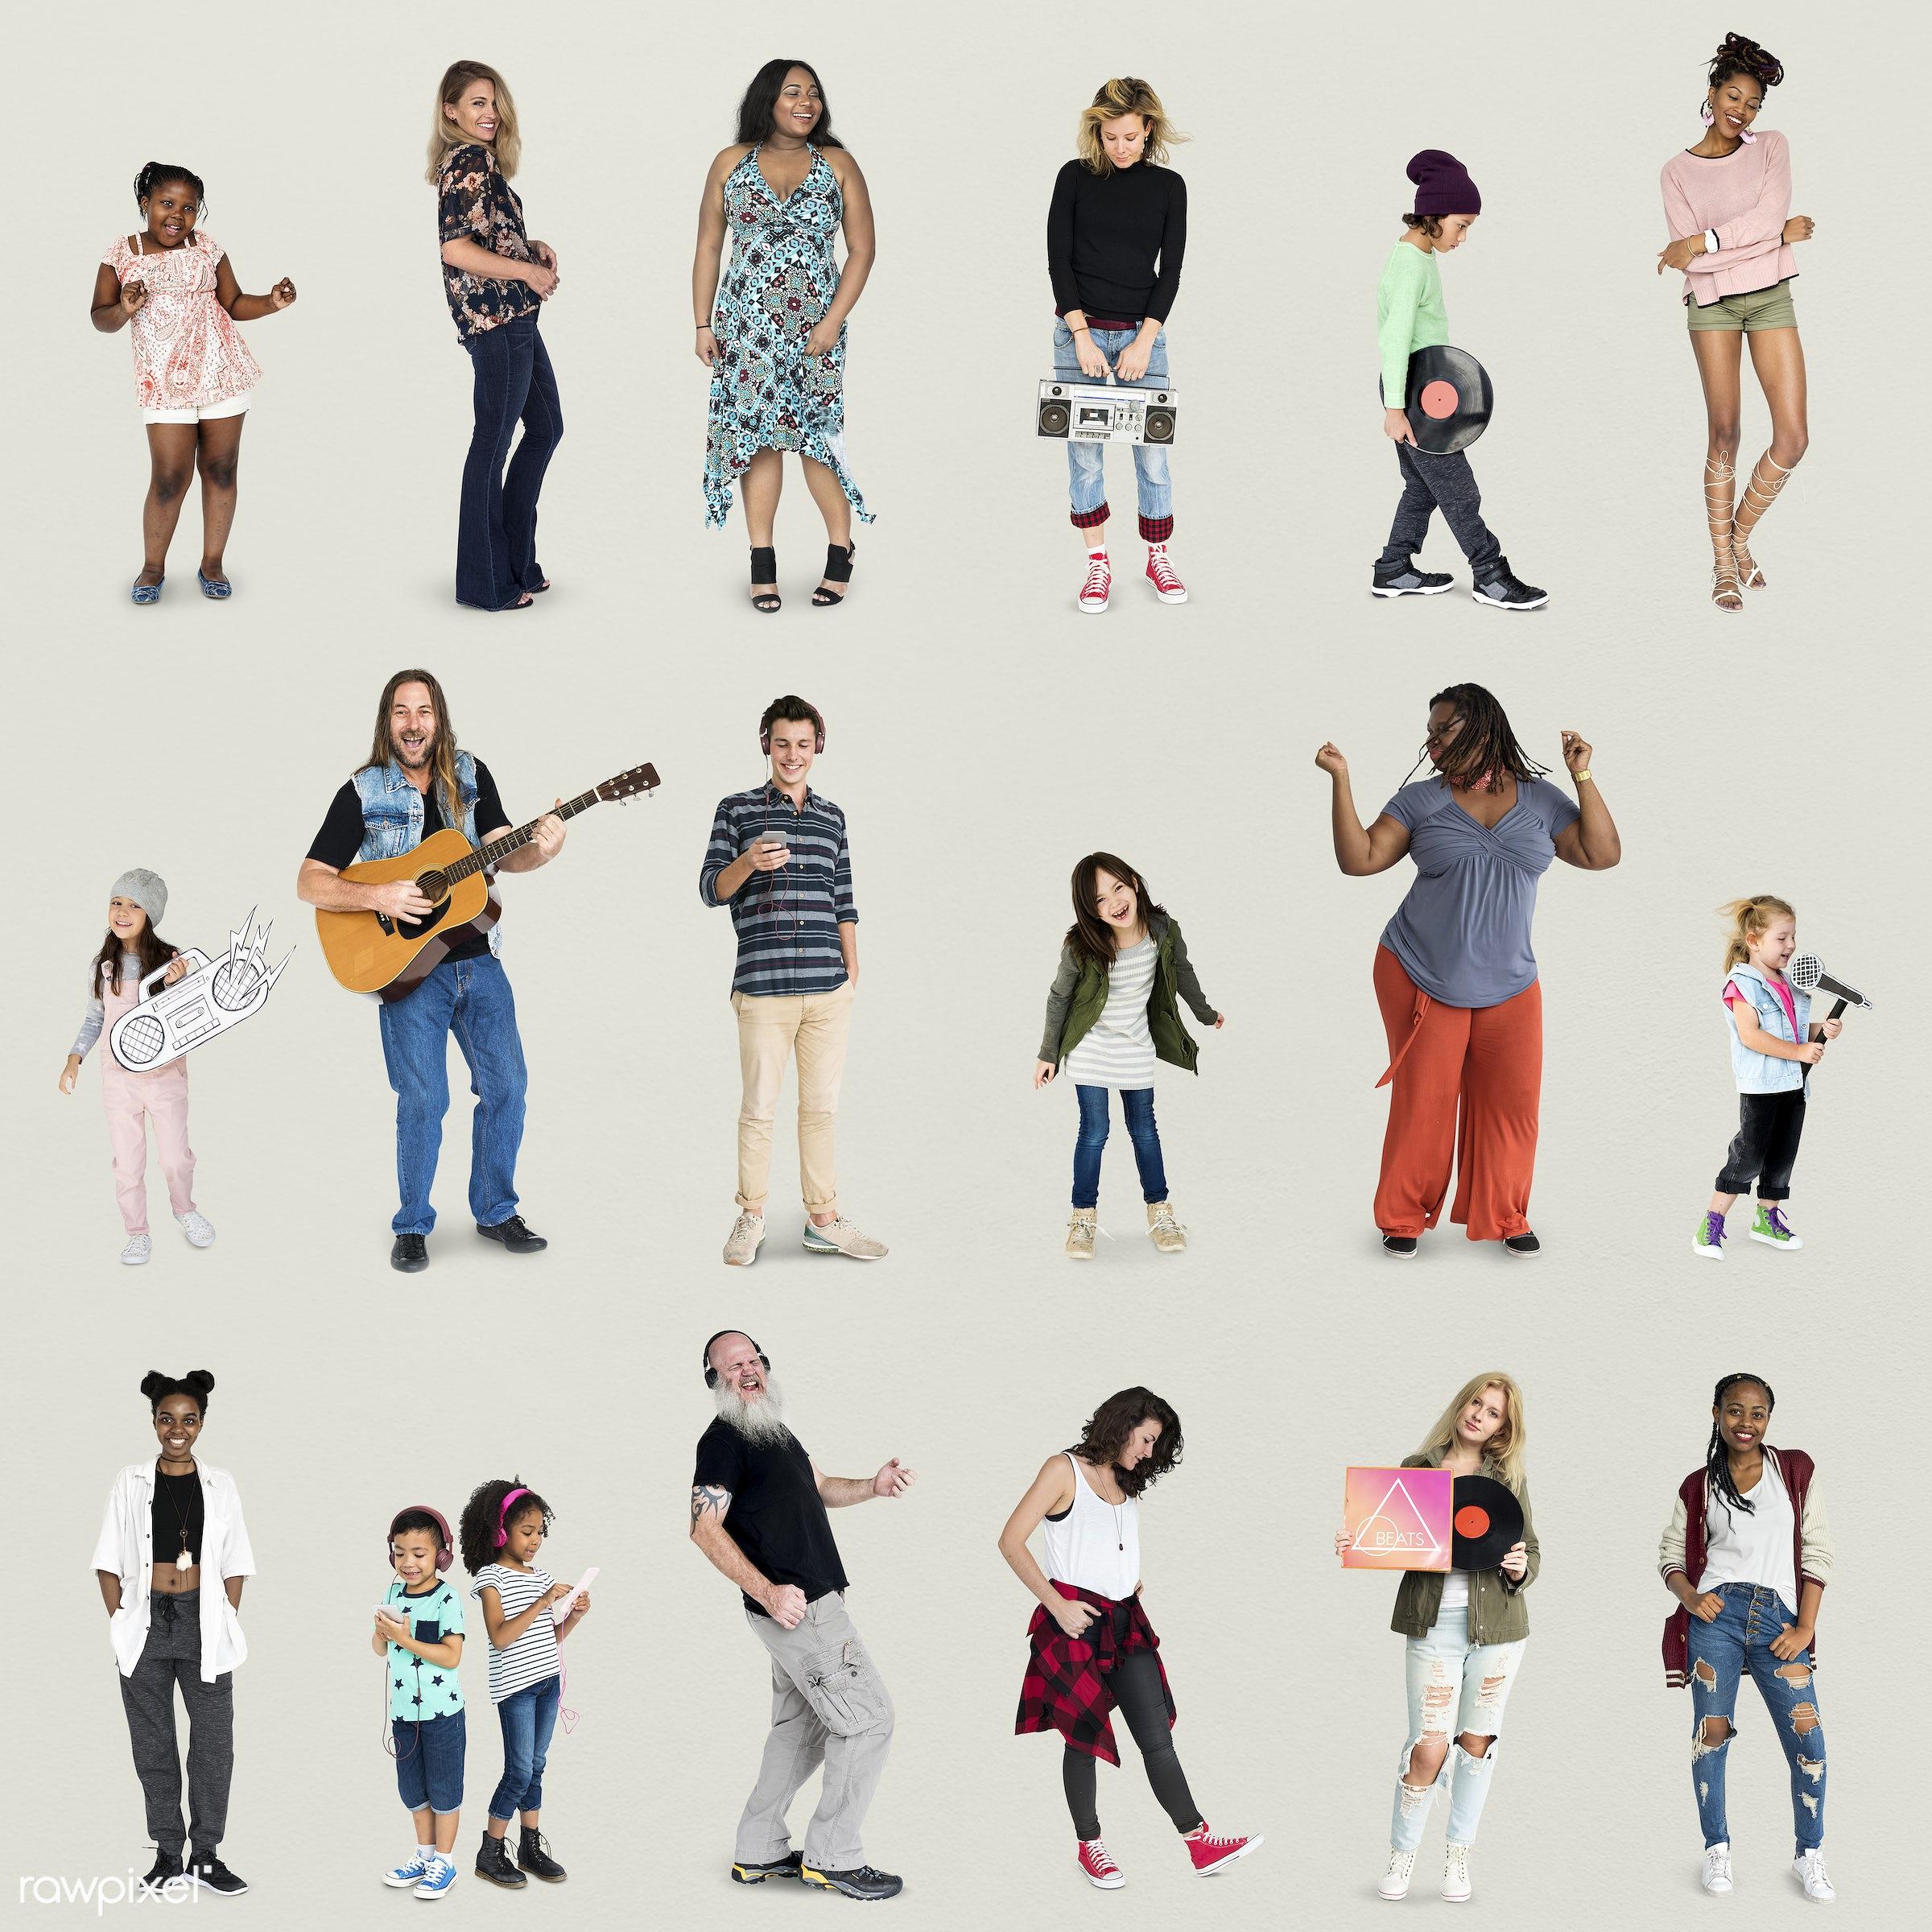 Diverse people set - studio, person, diverse, entertain, recreation, people, caucasian, asian, woman, lifestyle, cheerful,...